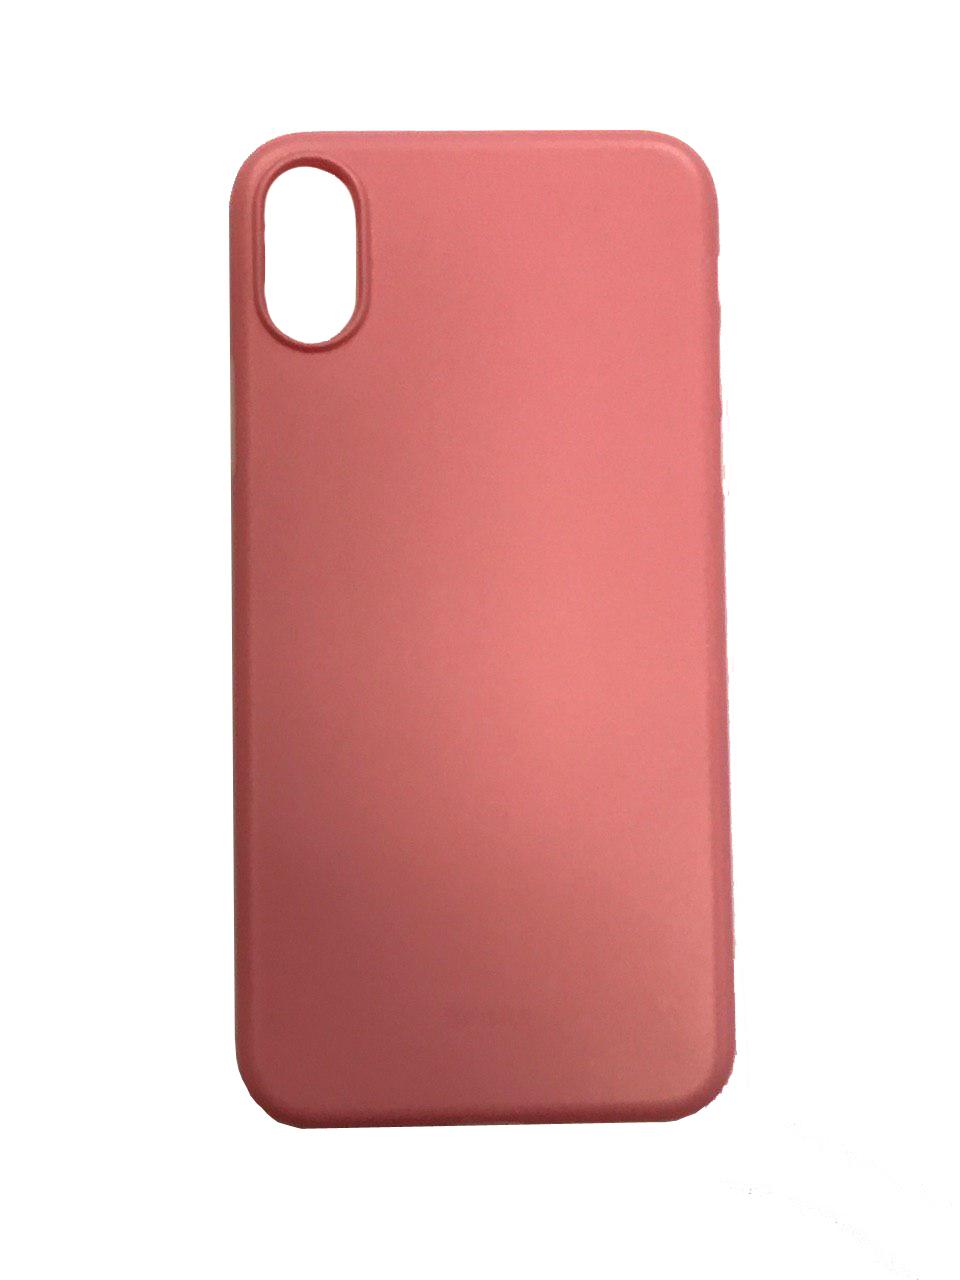 Чехол для сотового телефона Benks Чехол for iPhone X пластик (Pink), розовый glare free screen protector with cleaning cloth for iphone 3g